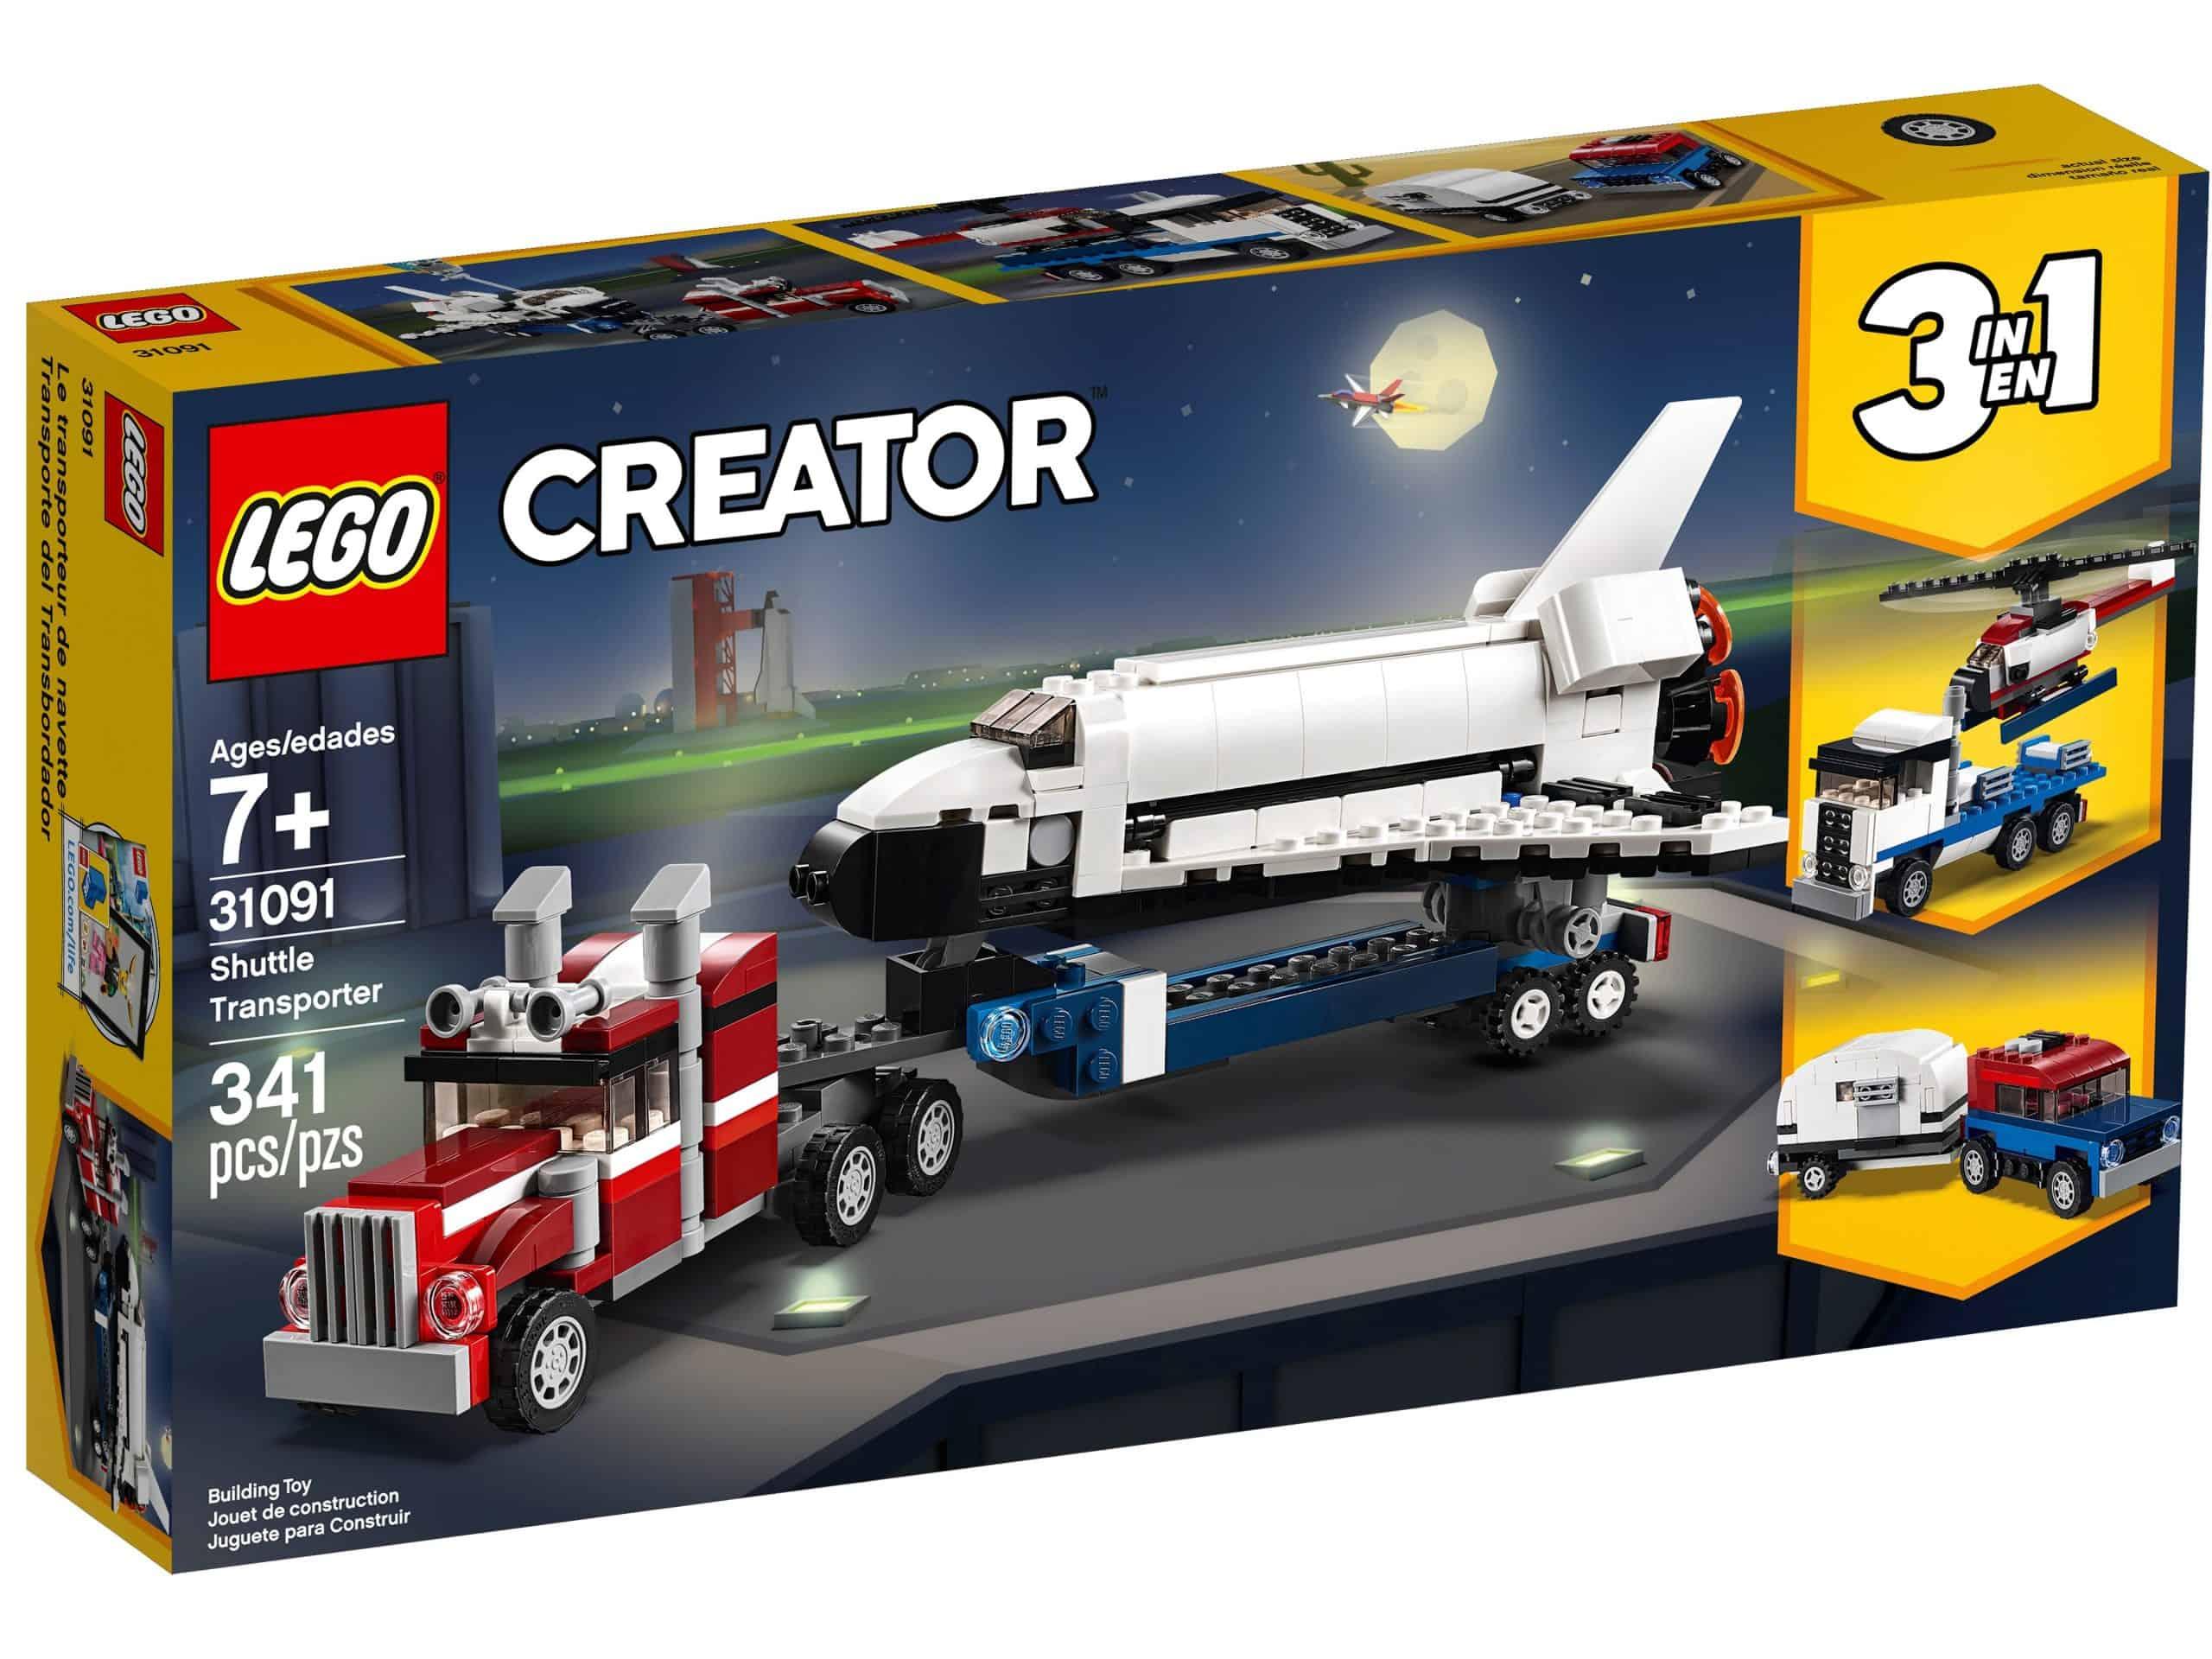 lego 31091 shuttle transporter scaled